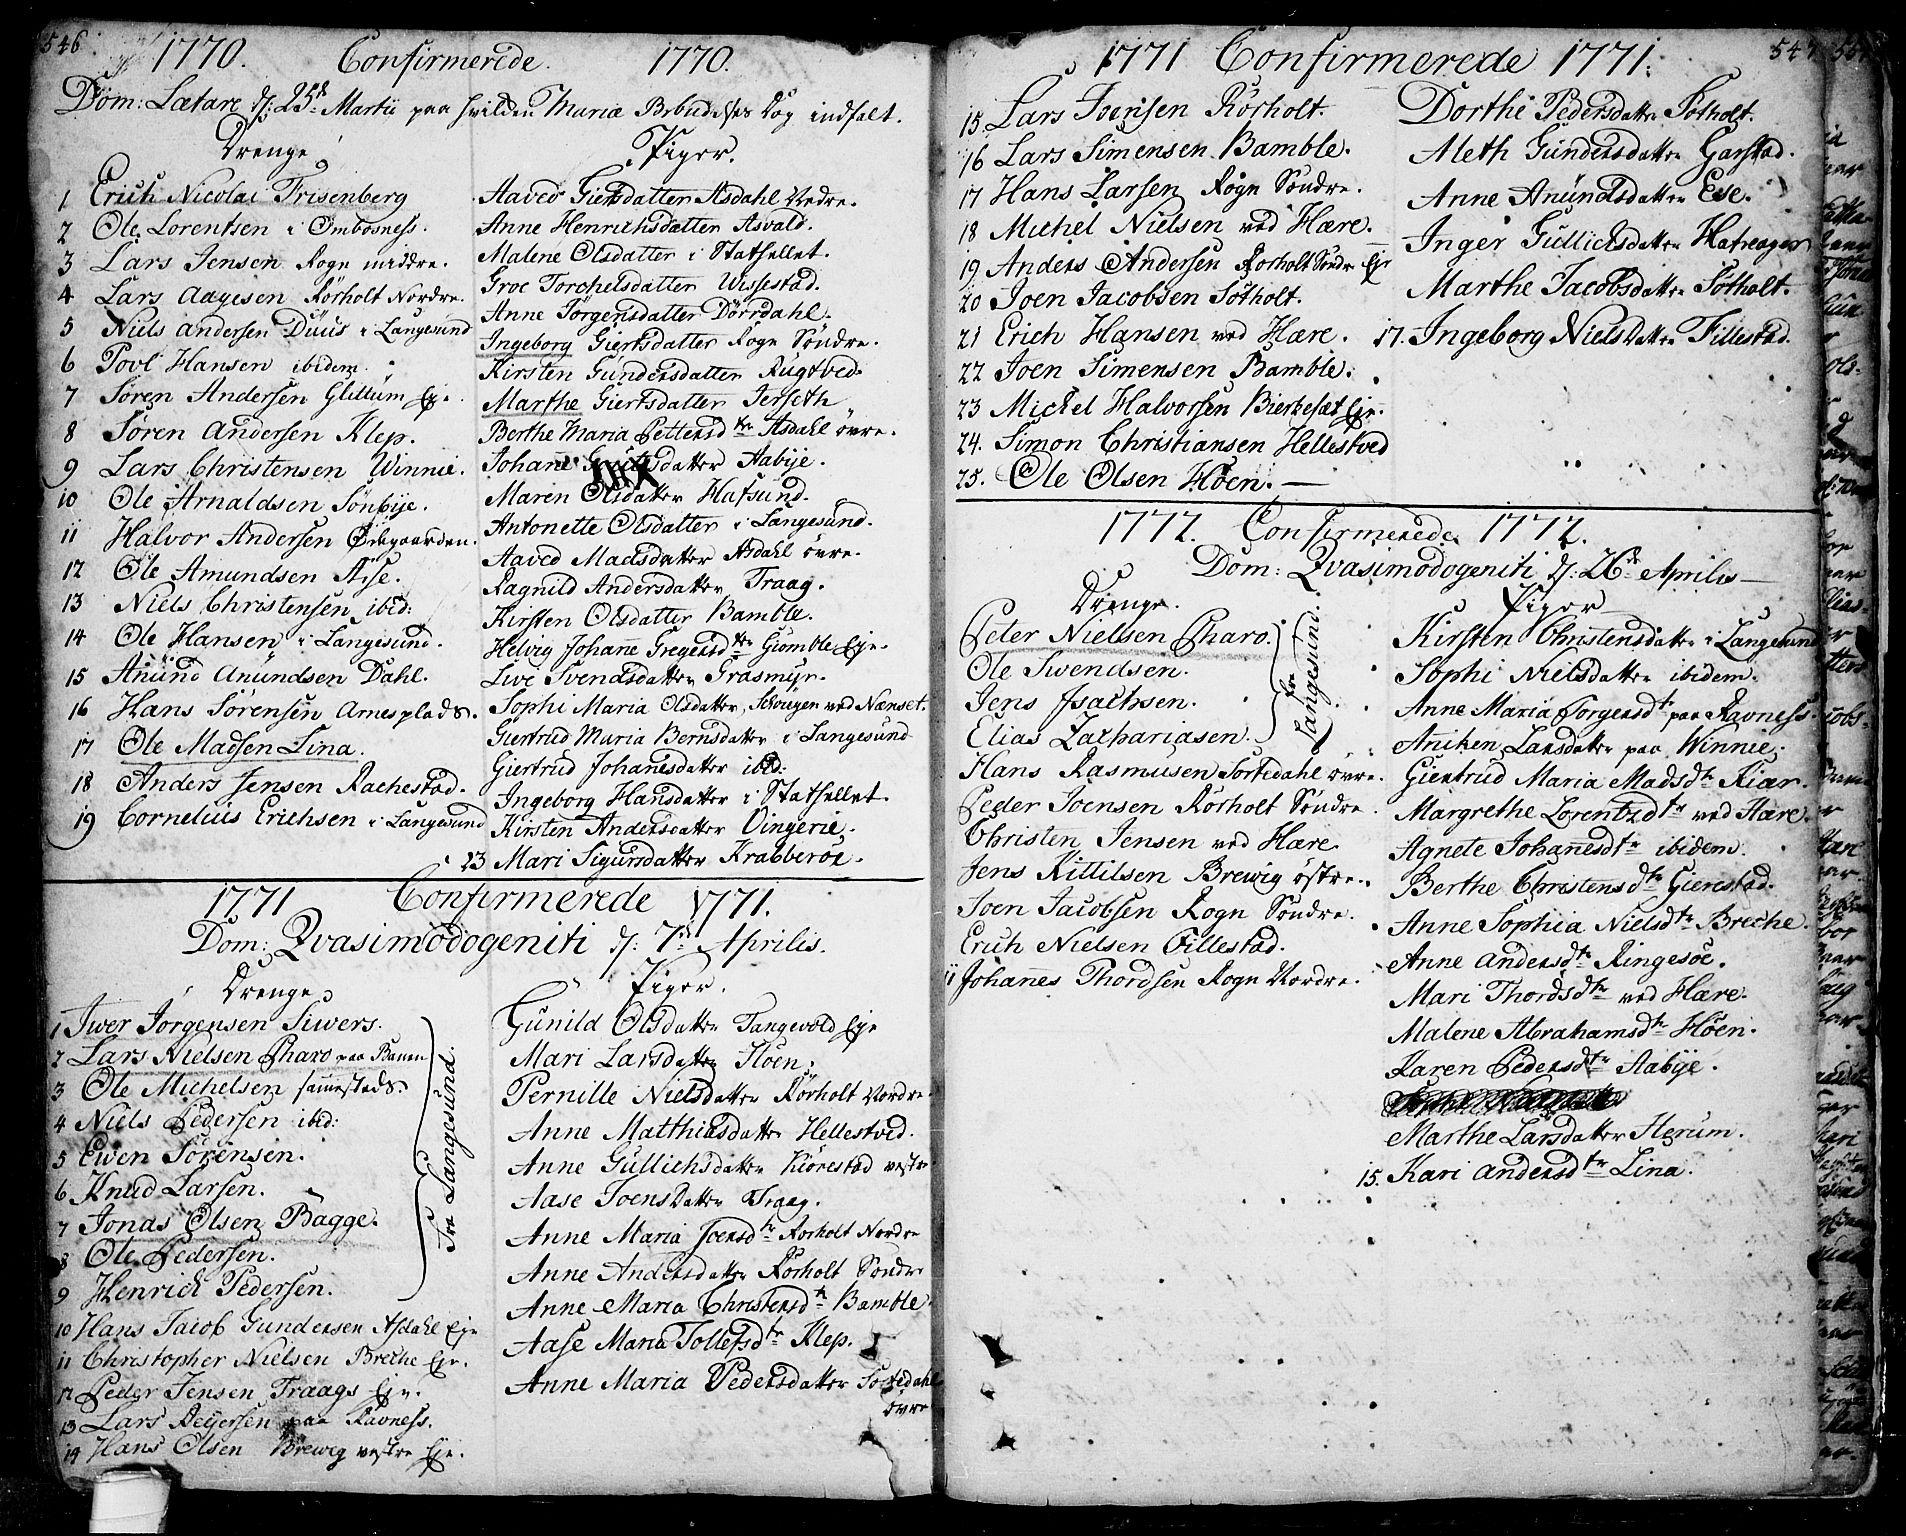 SAKO, Bamble kirkebøker, F/Fa/L0001: Ministerialbok nr. I 1, 1702-1774, s. 546-547